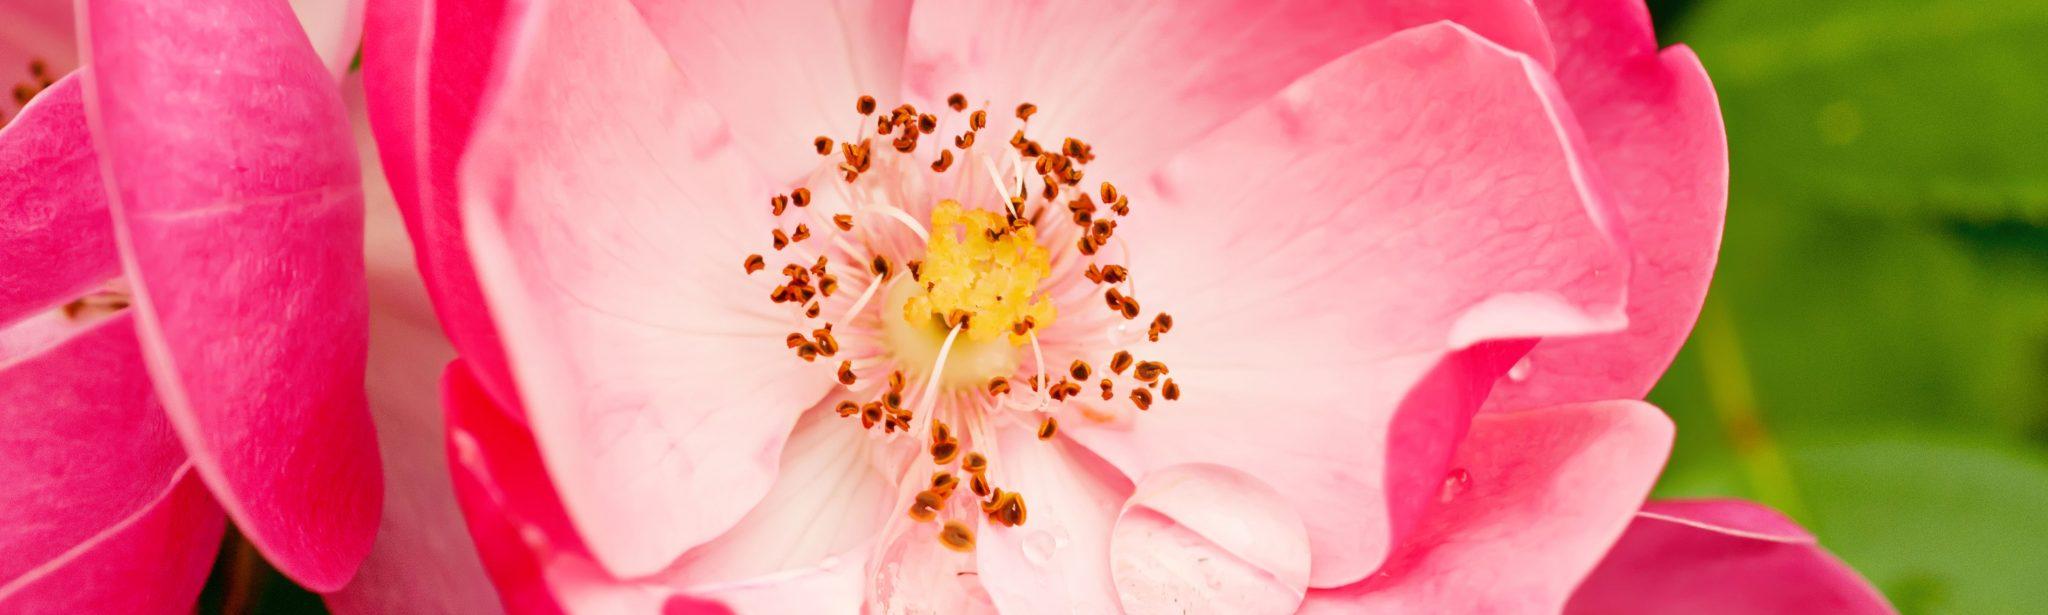 Rosehip-Flower